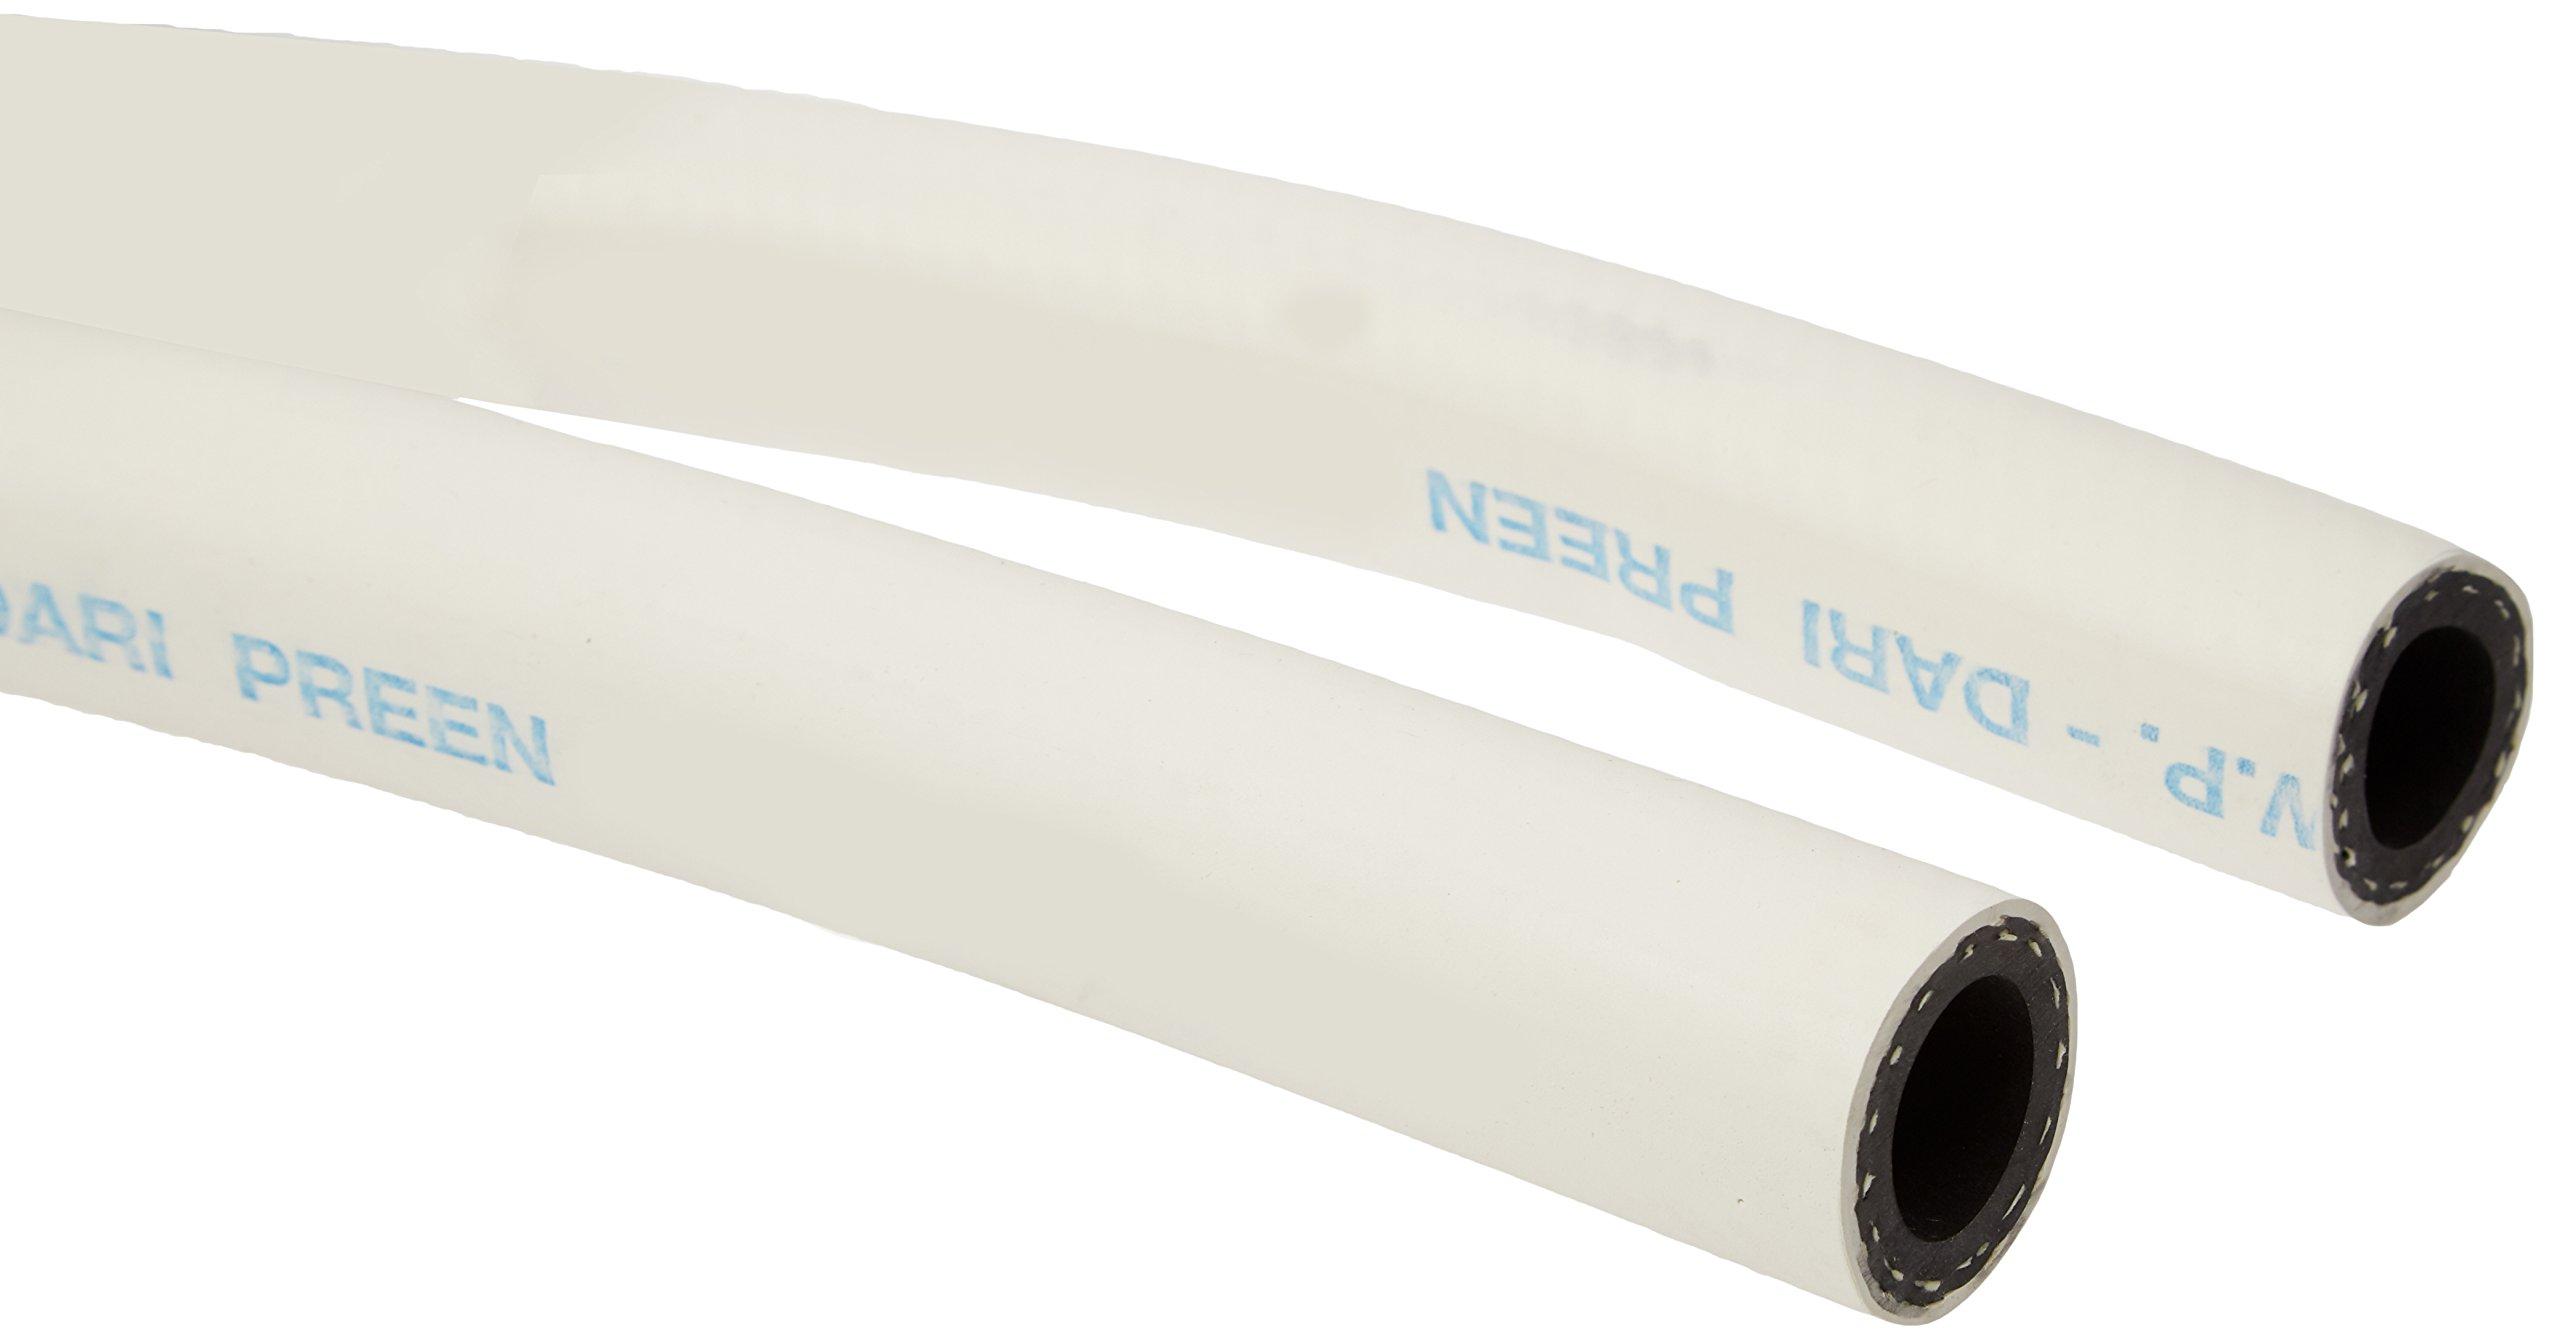 Thermoid 00544812450 EPDM Flex Strength Dari-Preen Creamery Hose, 200 psi Maximum Pressure, 50' Length, 3/4'' ID, White